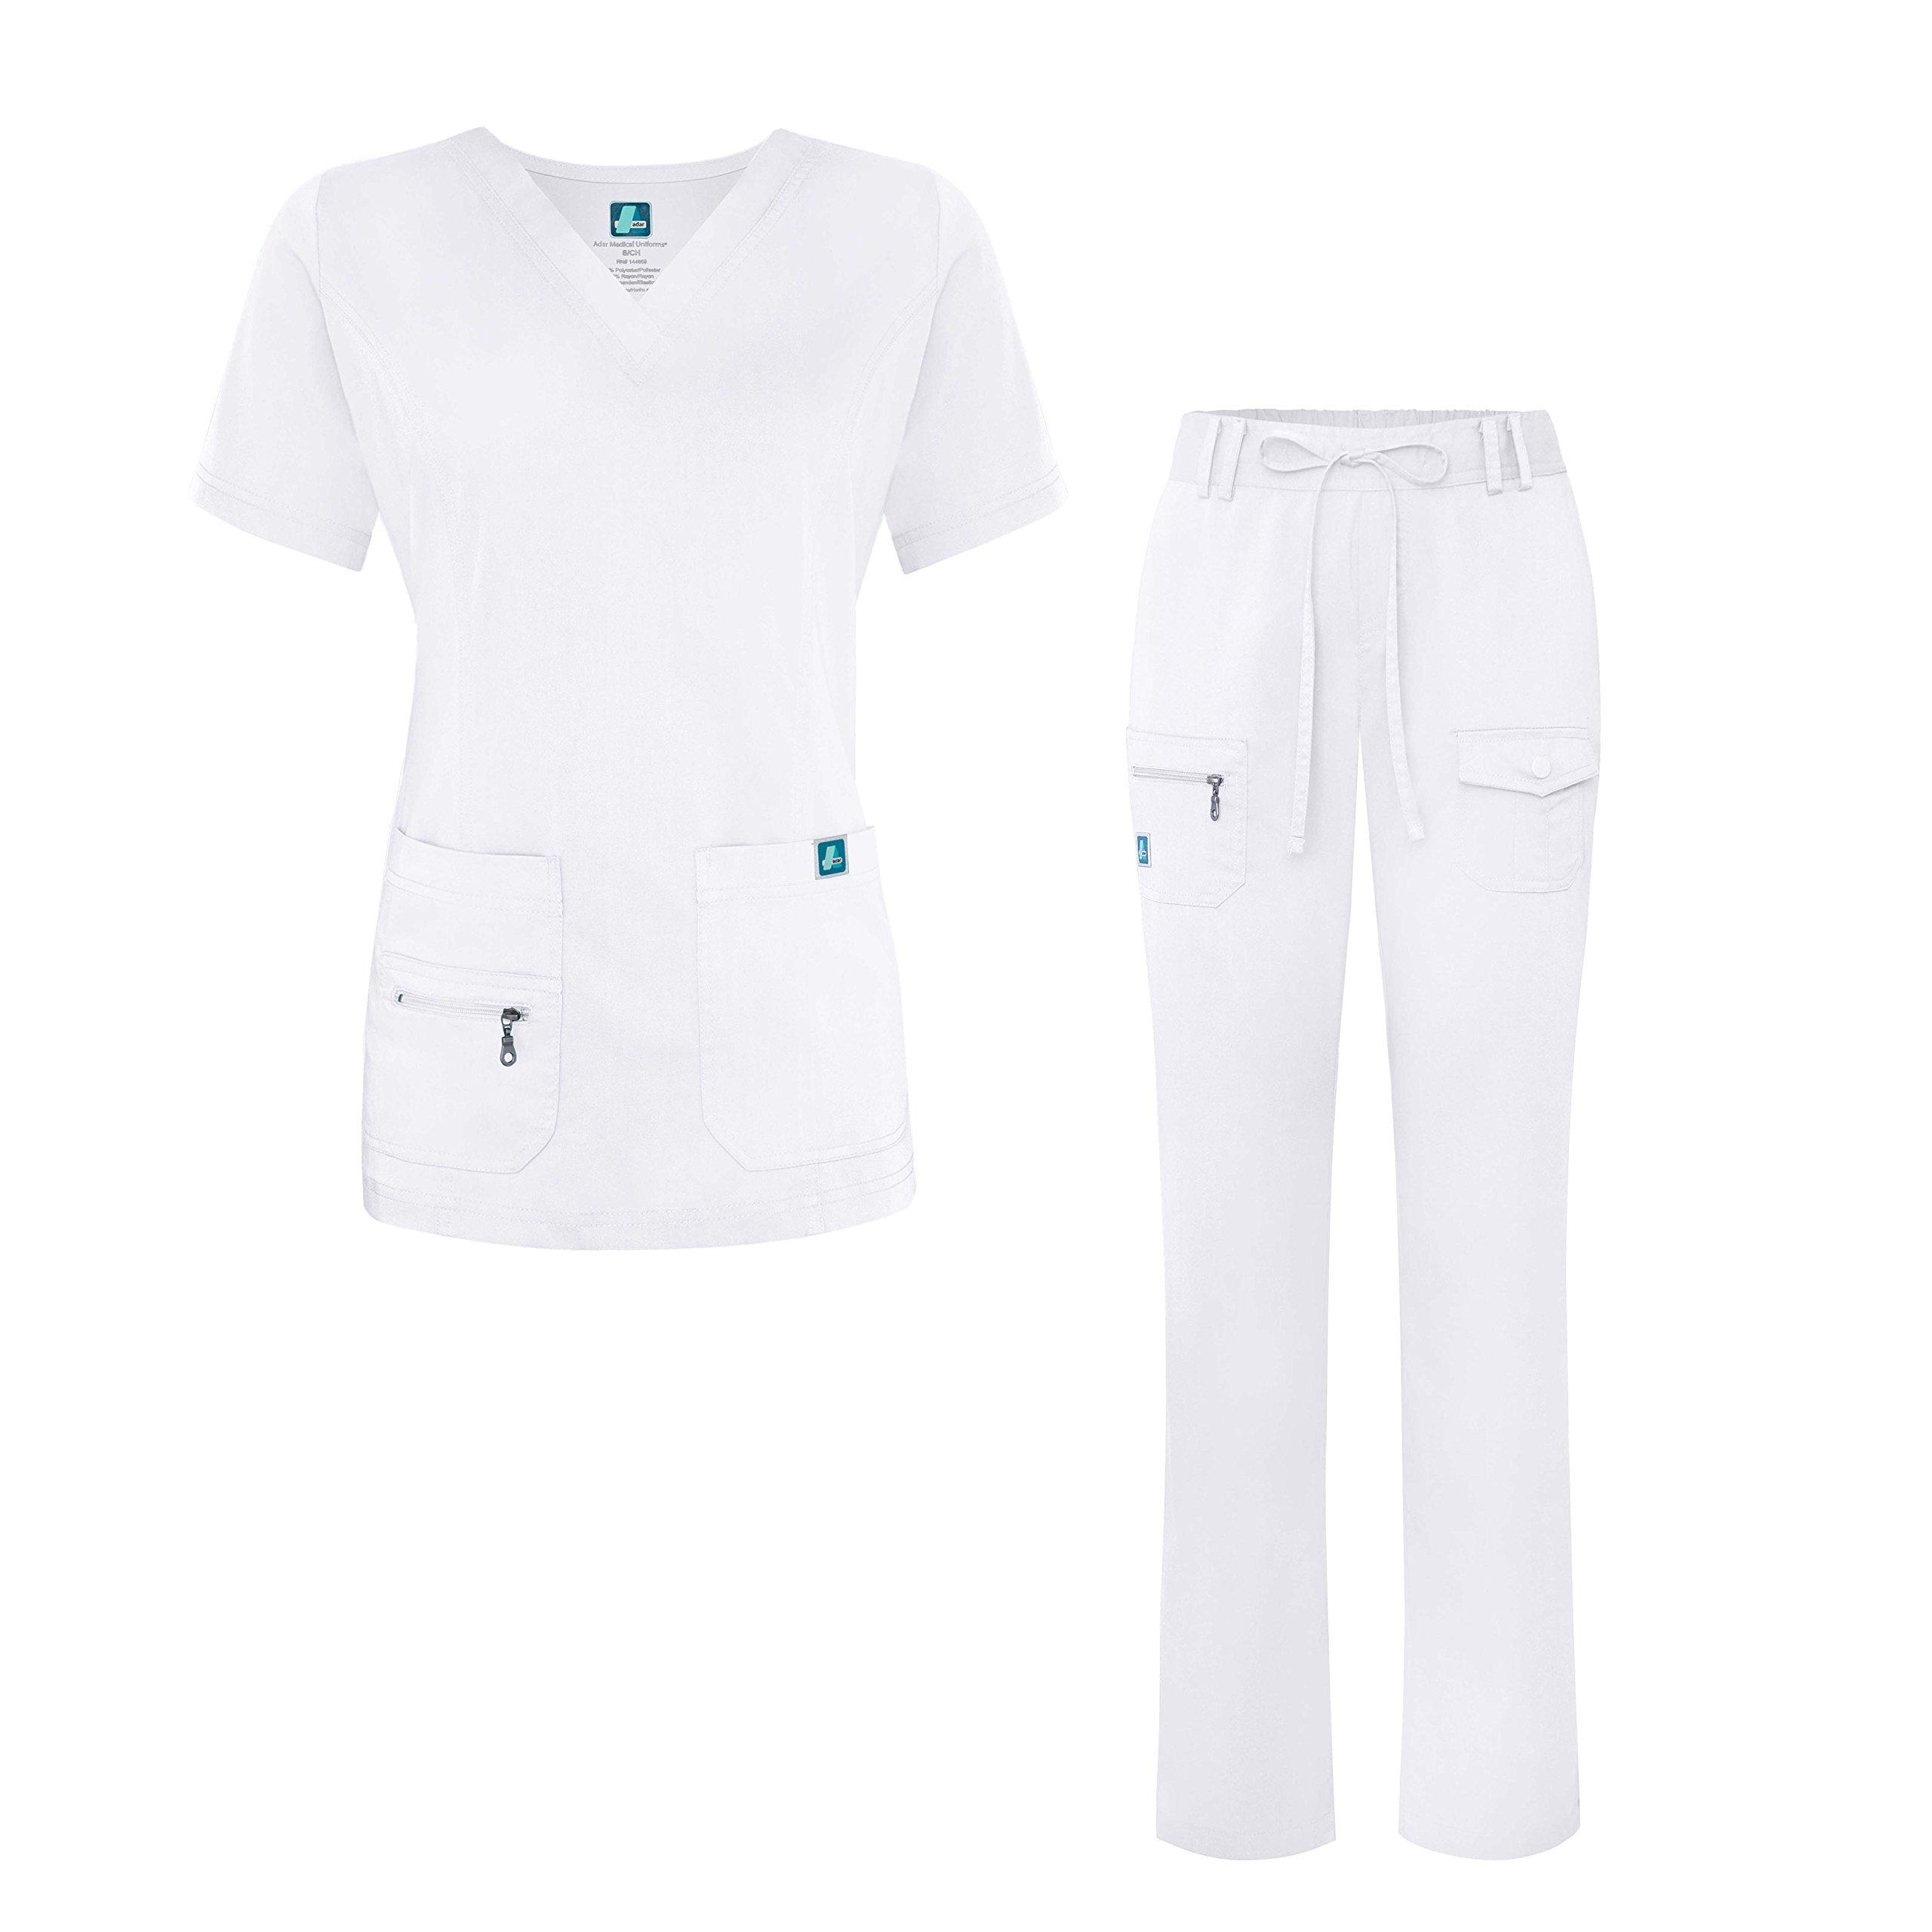 Adar Indulgence Jr. Fit Women's Scrub Set - Enhanced V-Neck Top/Multi Pocket Pants - 4400 - White - XL